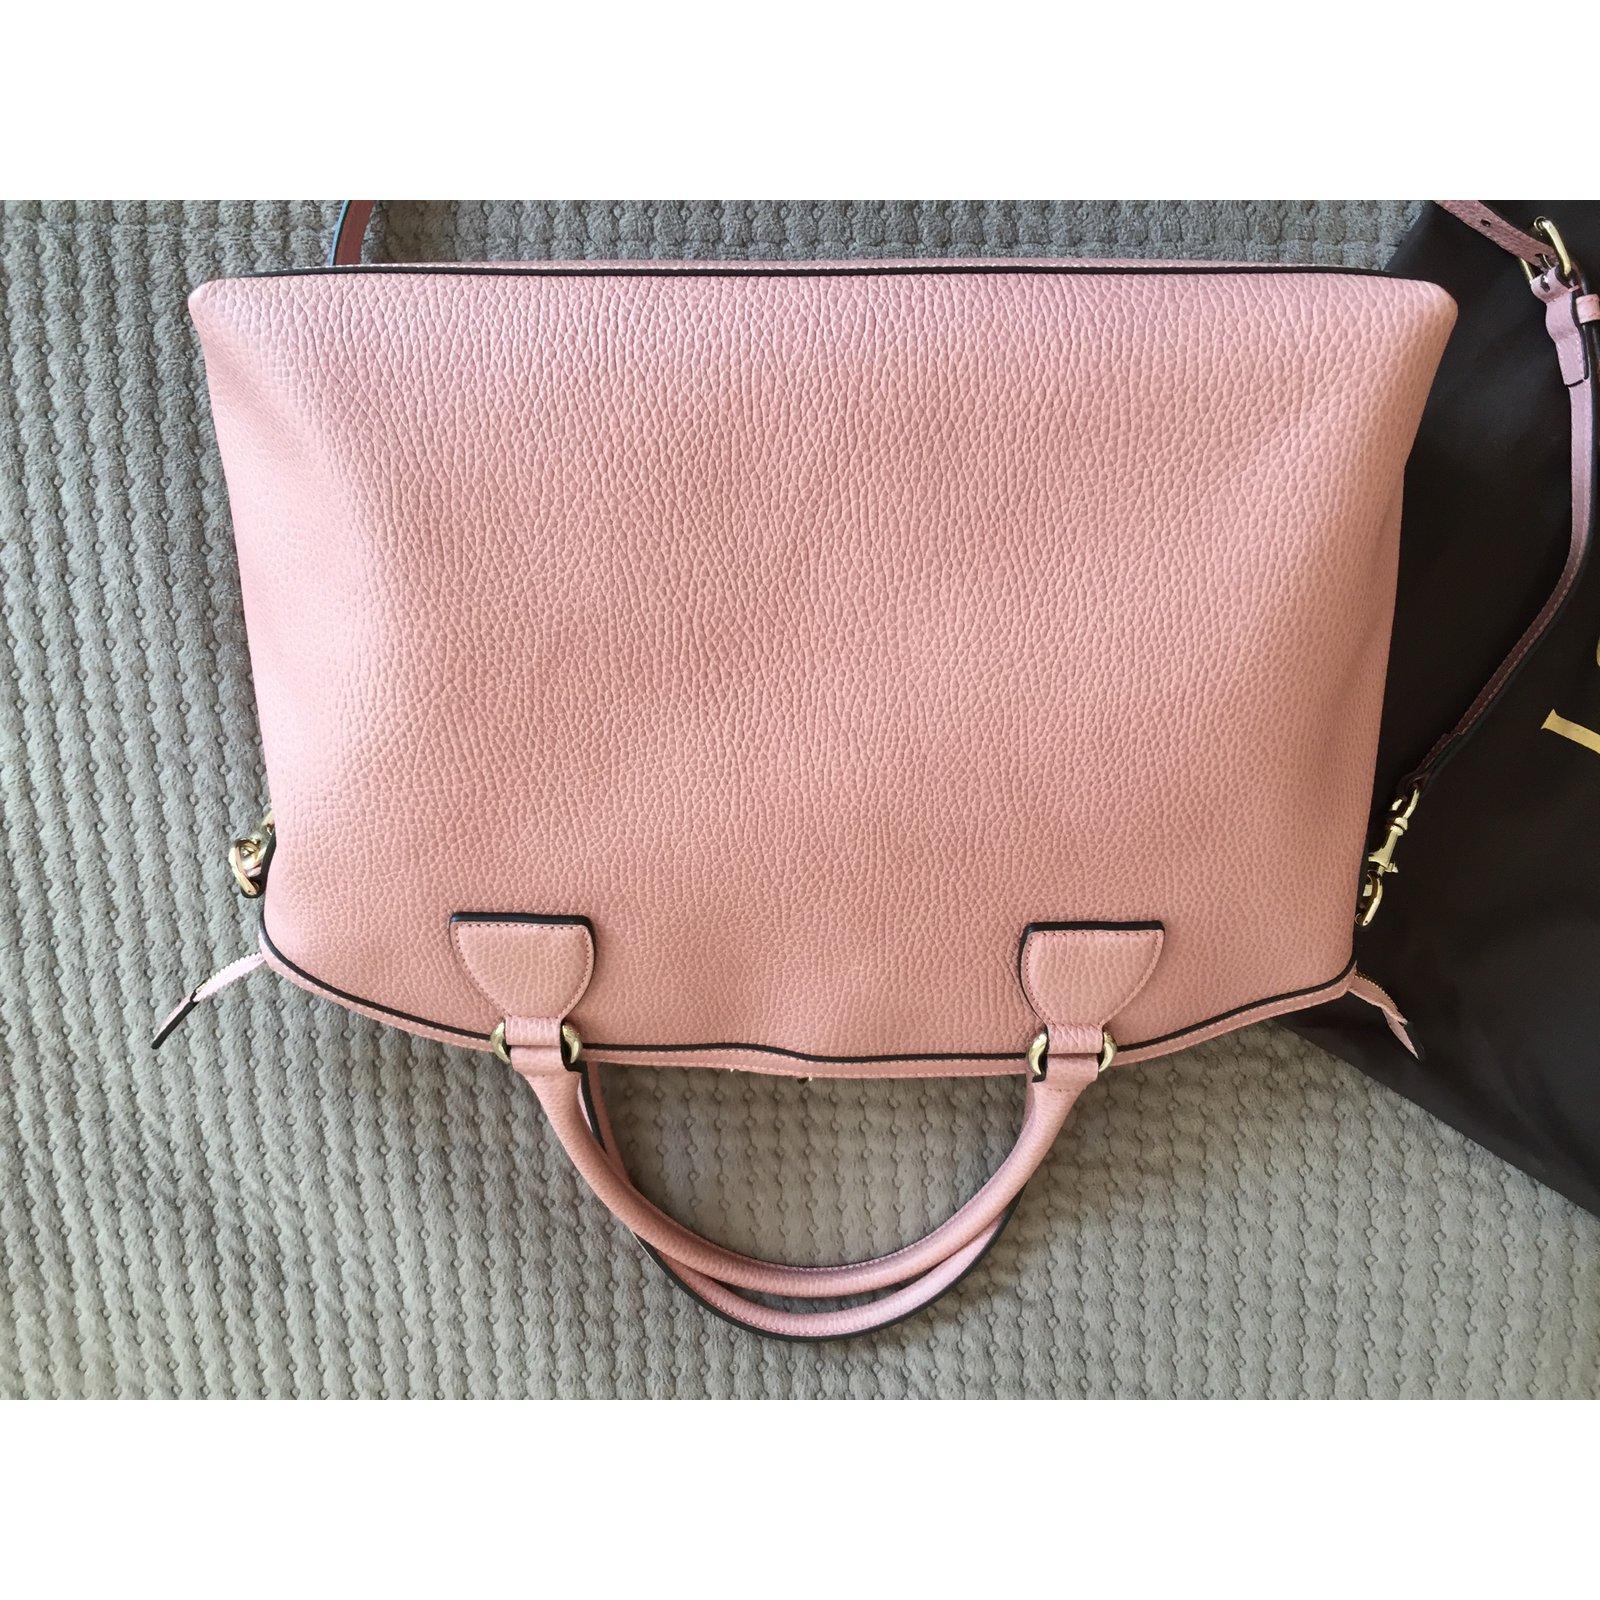 62585c8053b Gucci Gucci light pink leather bag-Brand New Totes Leather Pink ref.68145 -  Joli Closet